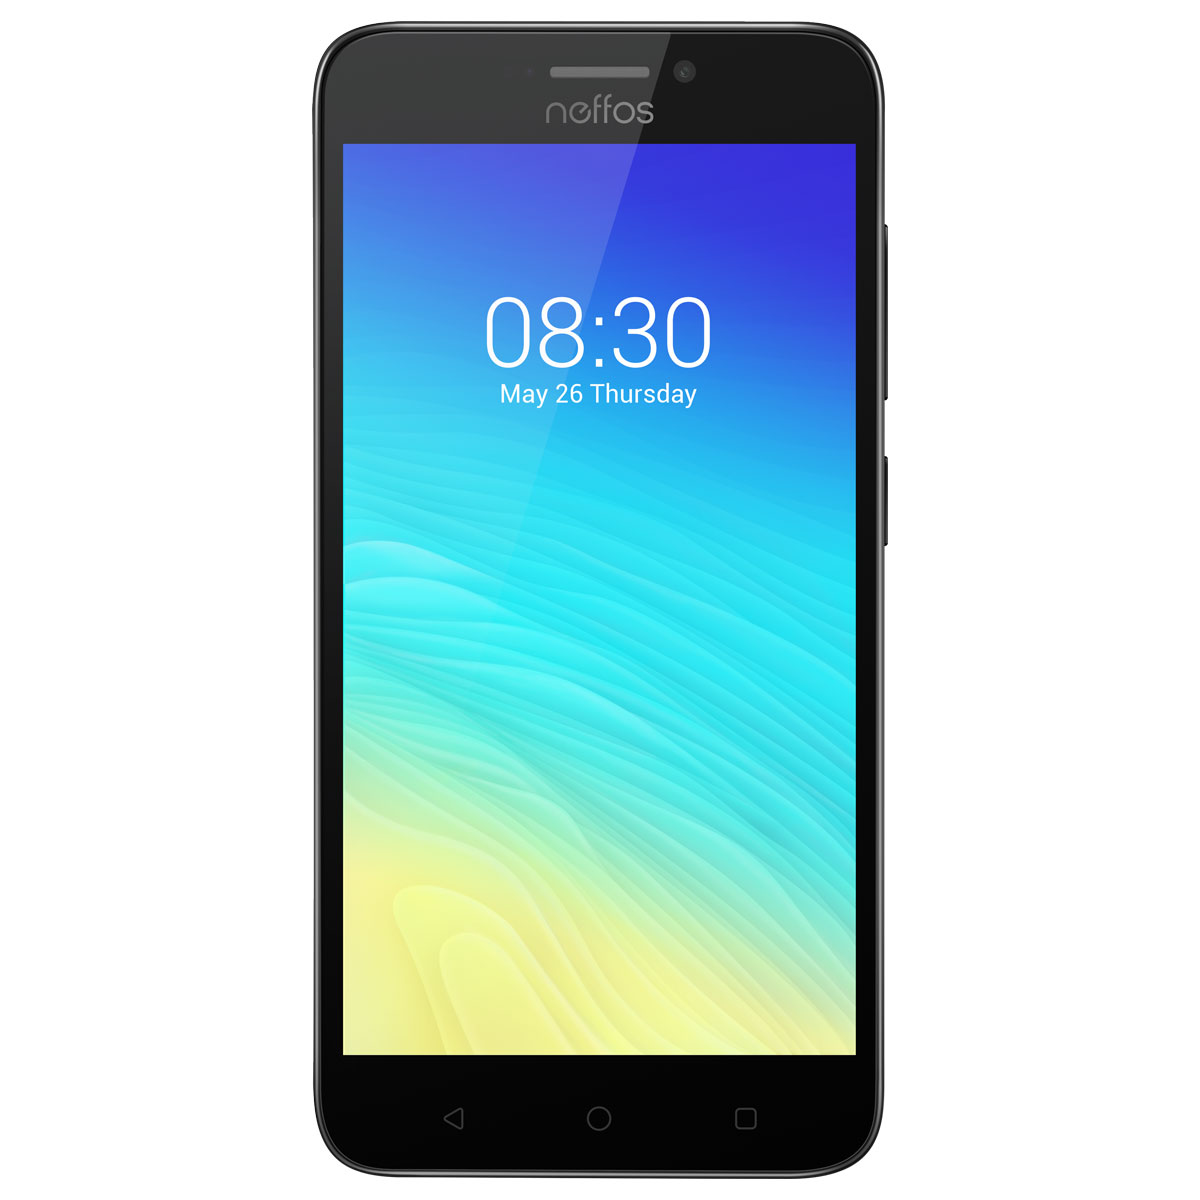 "Mobile & smartphone Neffos Y5S Gris ciel Smartphone 4G-LTE Dual SIM - Snapdragon 212 Quad-Core 1.3 GHz - RAM 2 Go - Ecran tactile 5"" 720 x 1280 - 16 Go - Bluetooth 4.1 - 2450 mAh - Android 7.1"